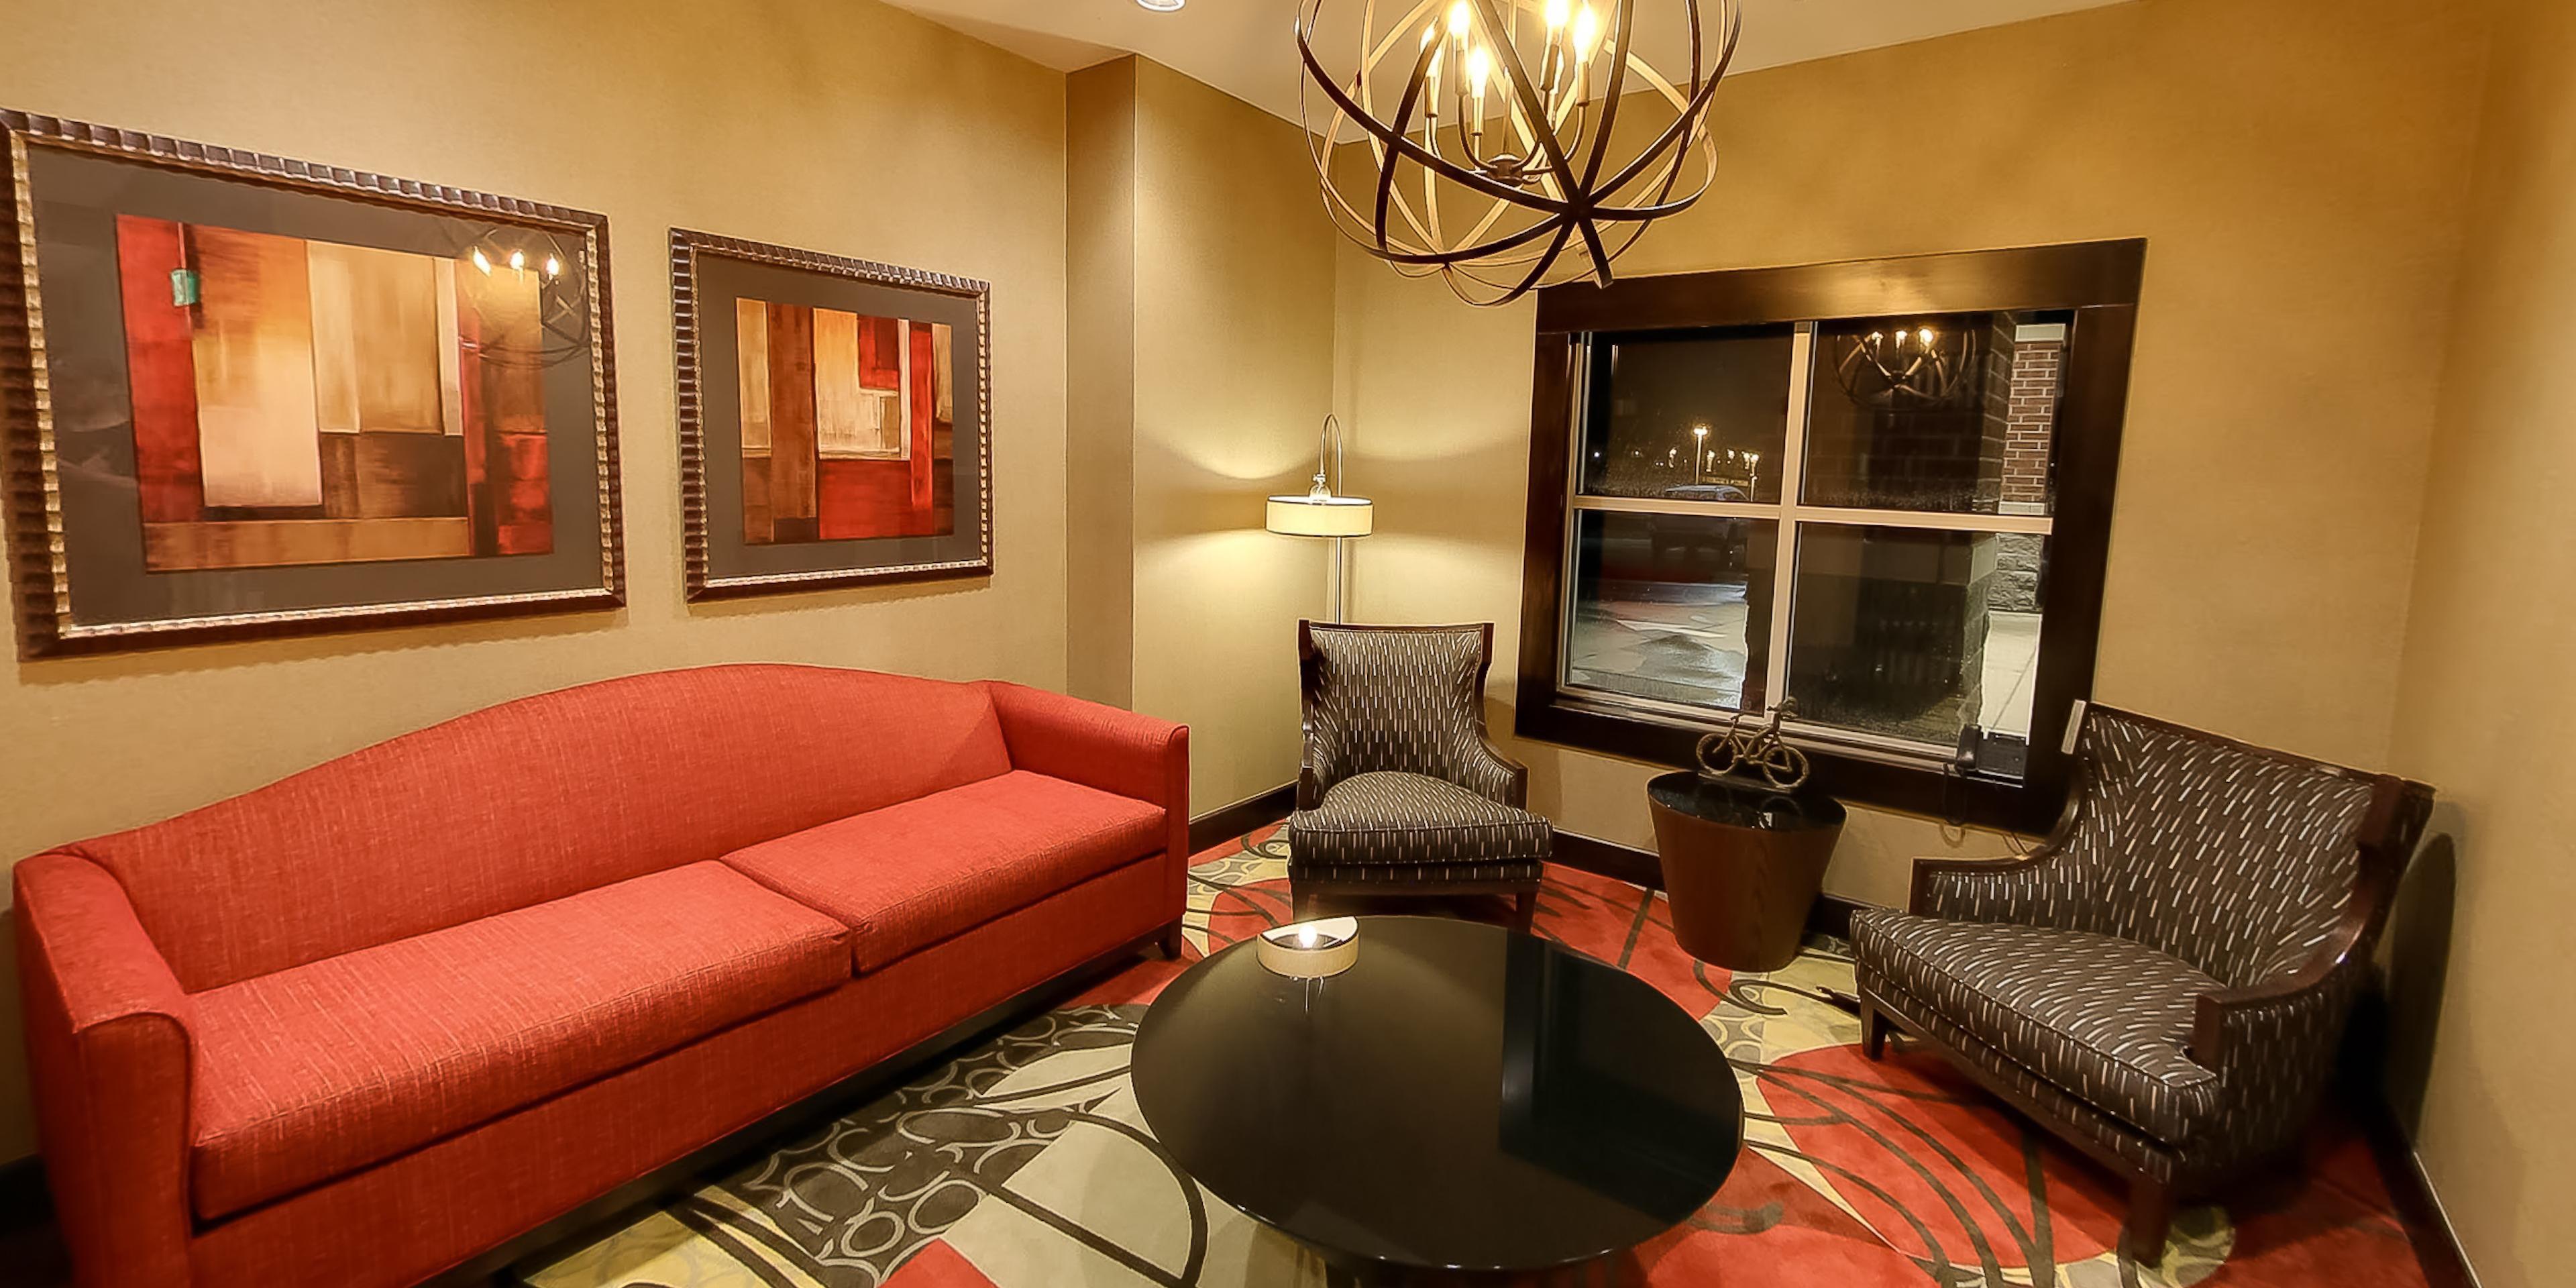 ... Holiday Inn Express Plymouth, MI   Ann Arbor Area   Lobby Seating ...